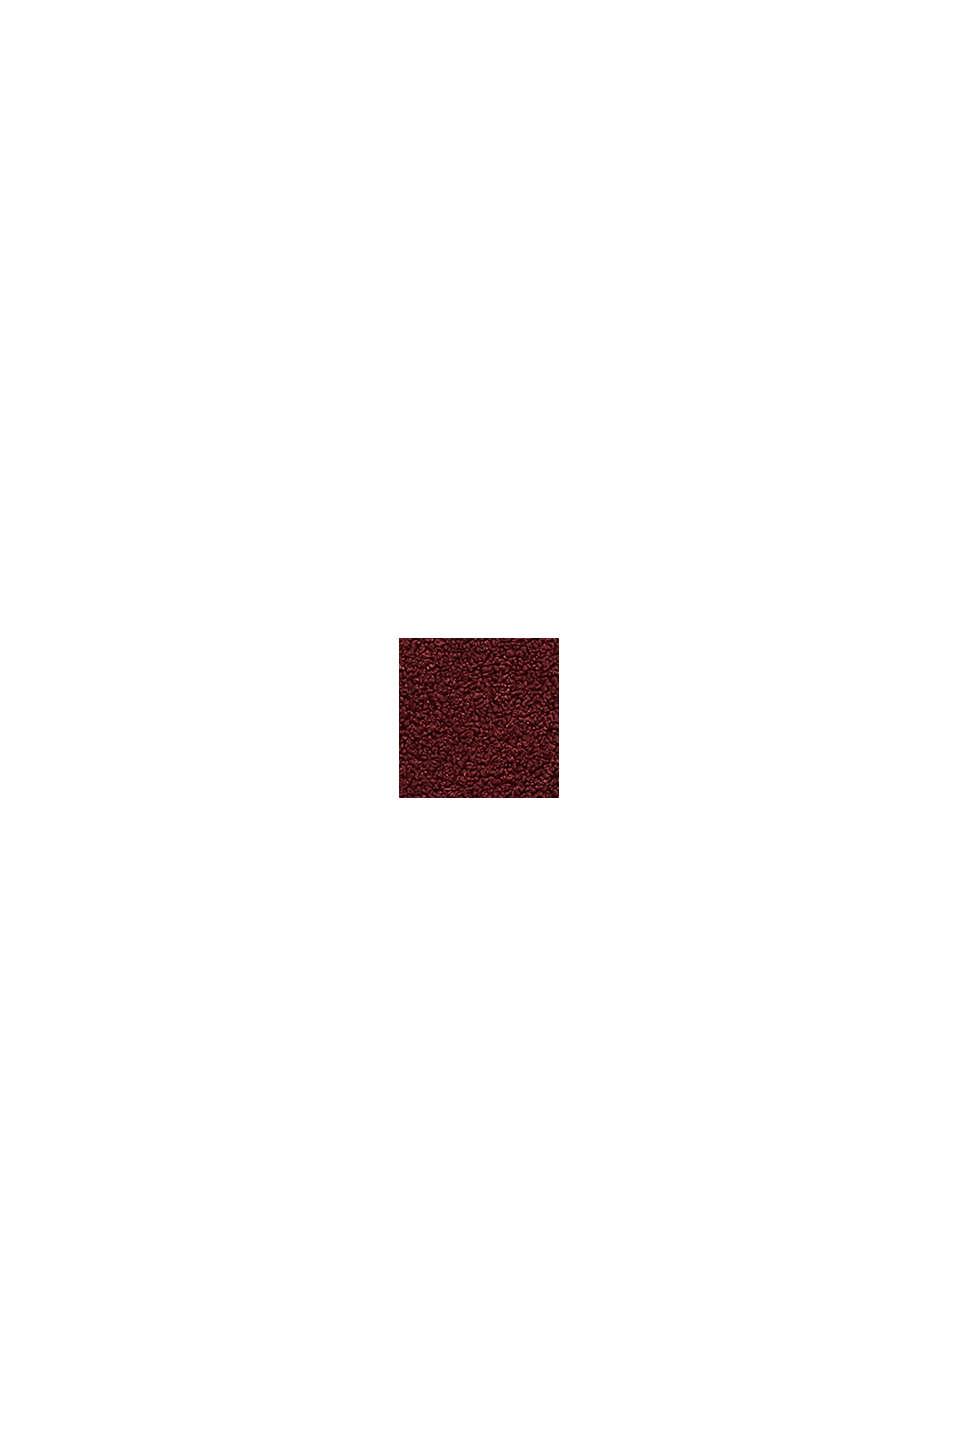 Doubleface-Mantel in Teddy-Optik, BORDEAUX RED, swatch